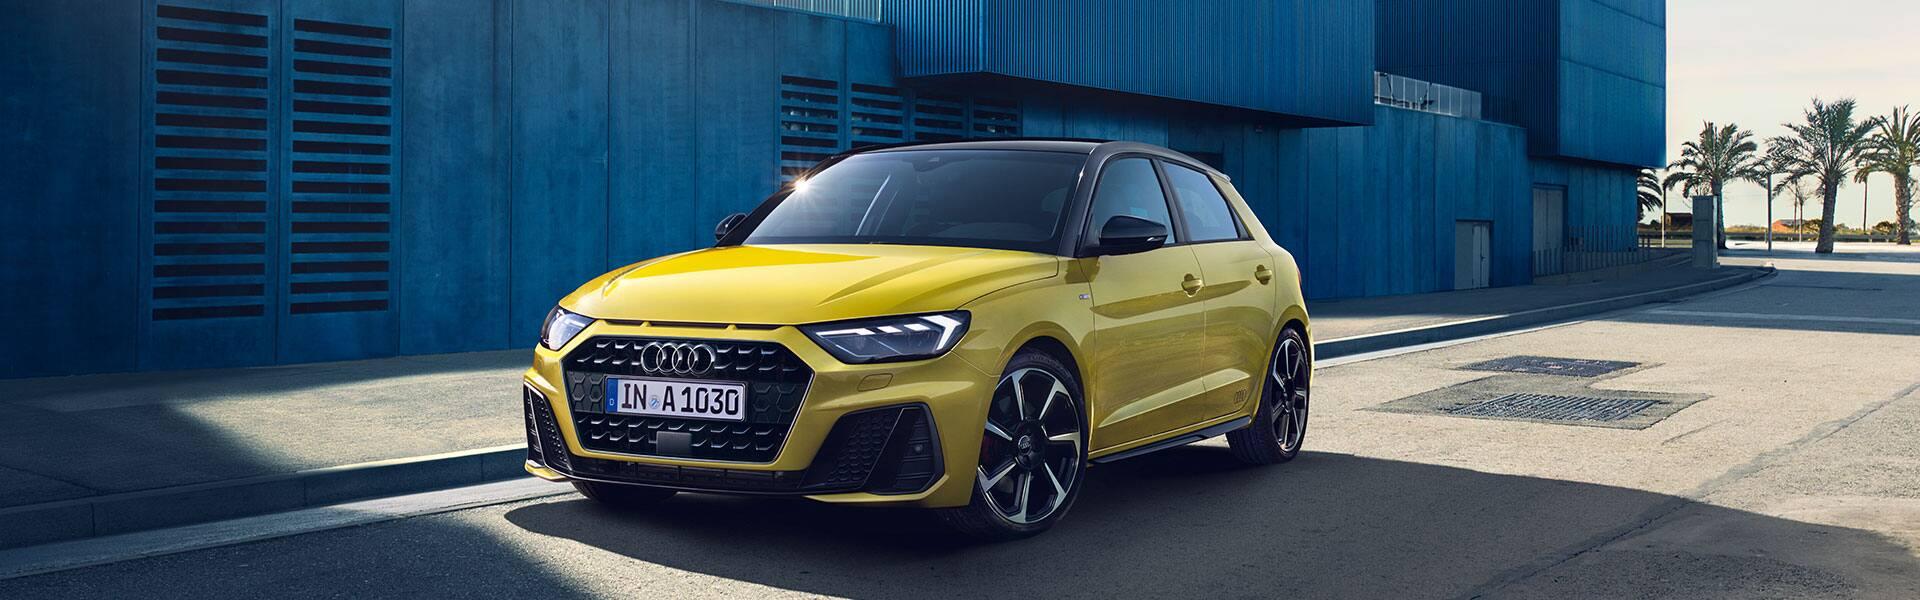 Nowe Audi A1 Sportback